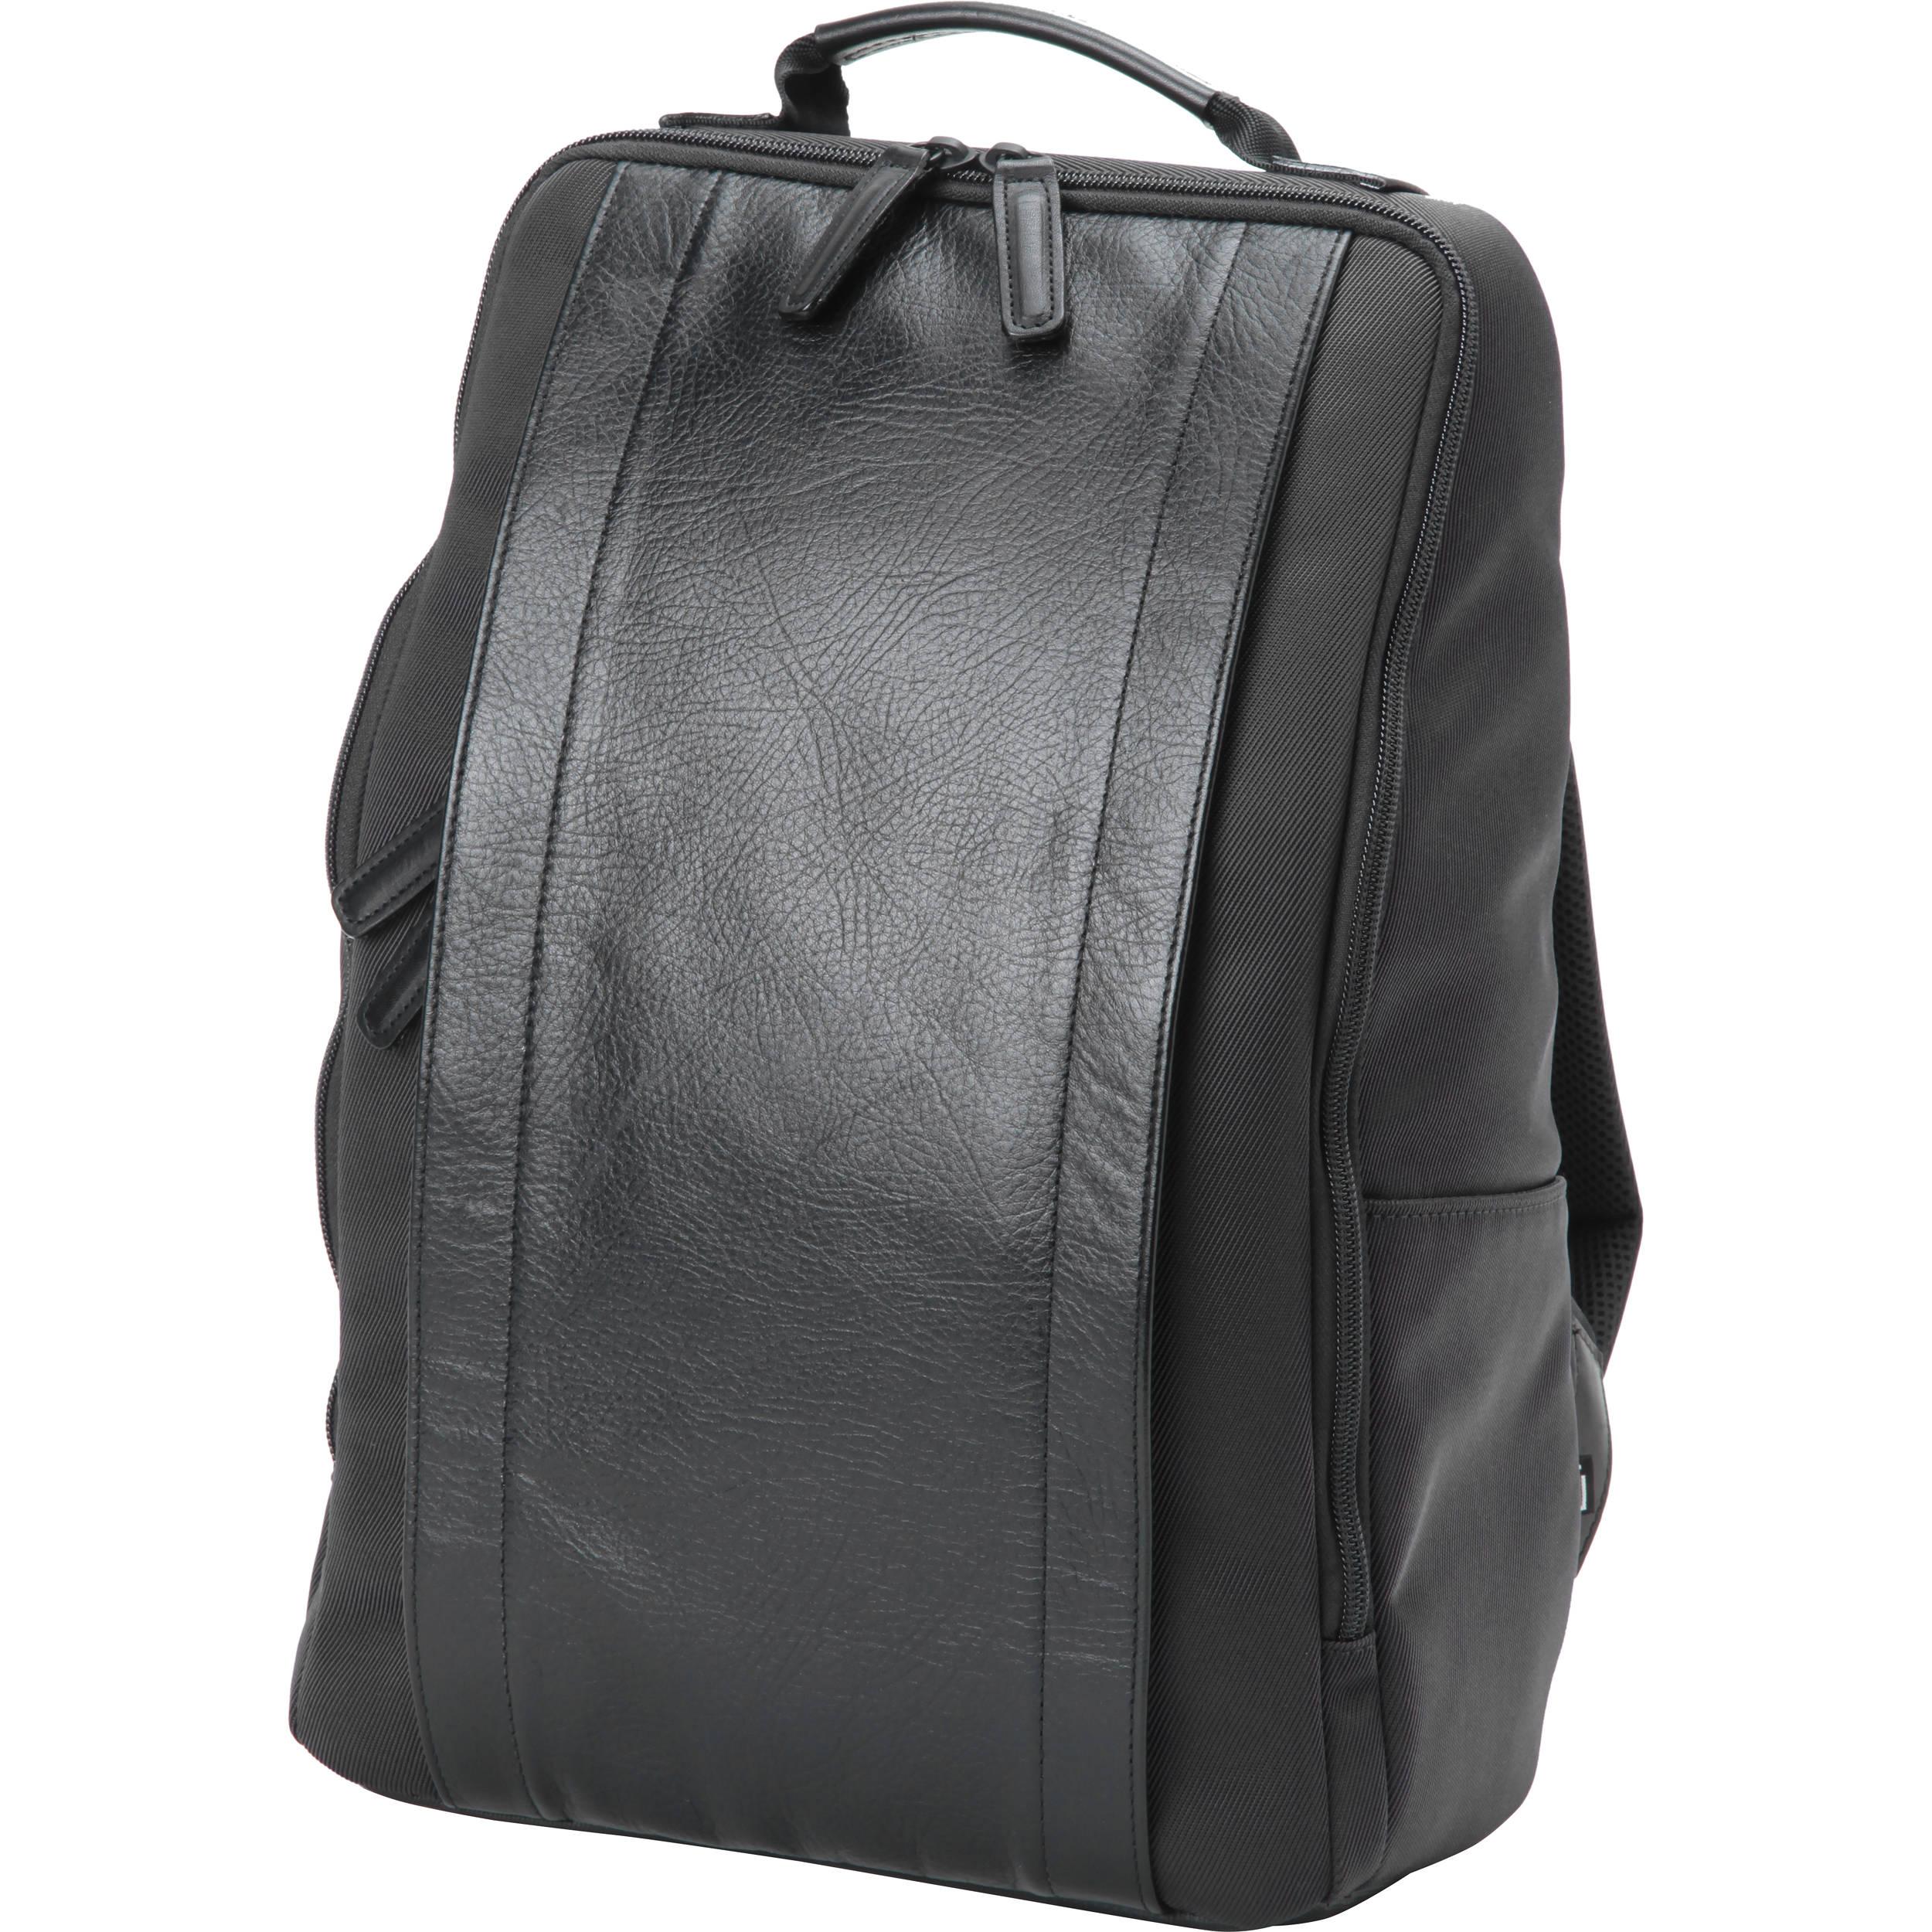 Artisan Artist Rr4 06c Camera Backpack Black Aarr406cblk B H